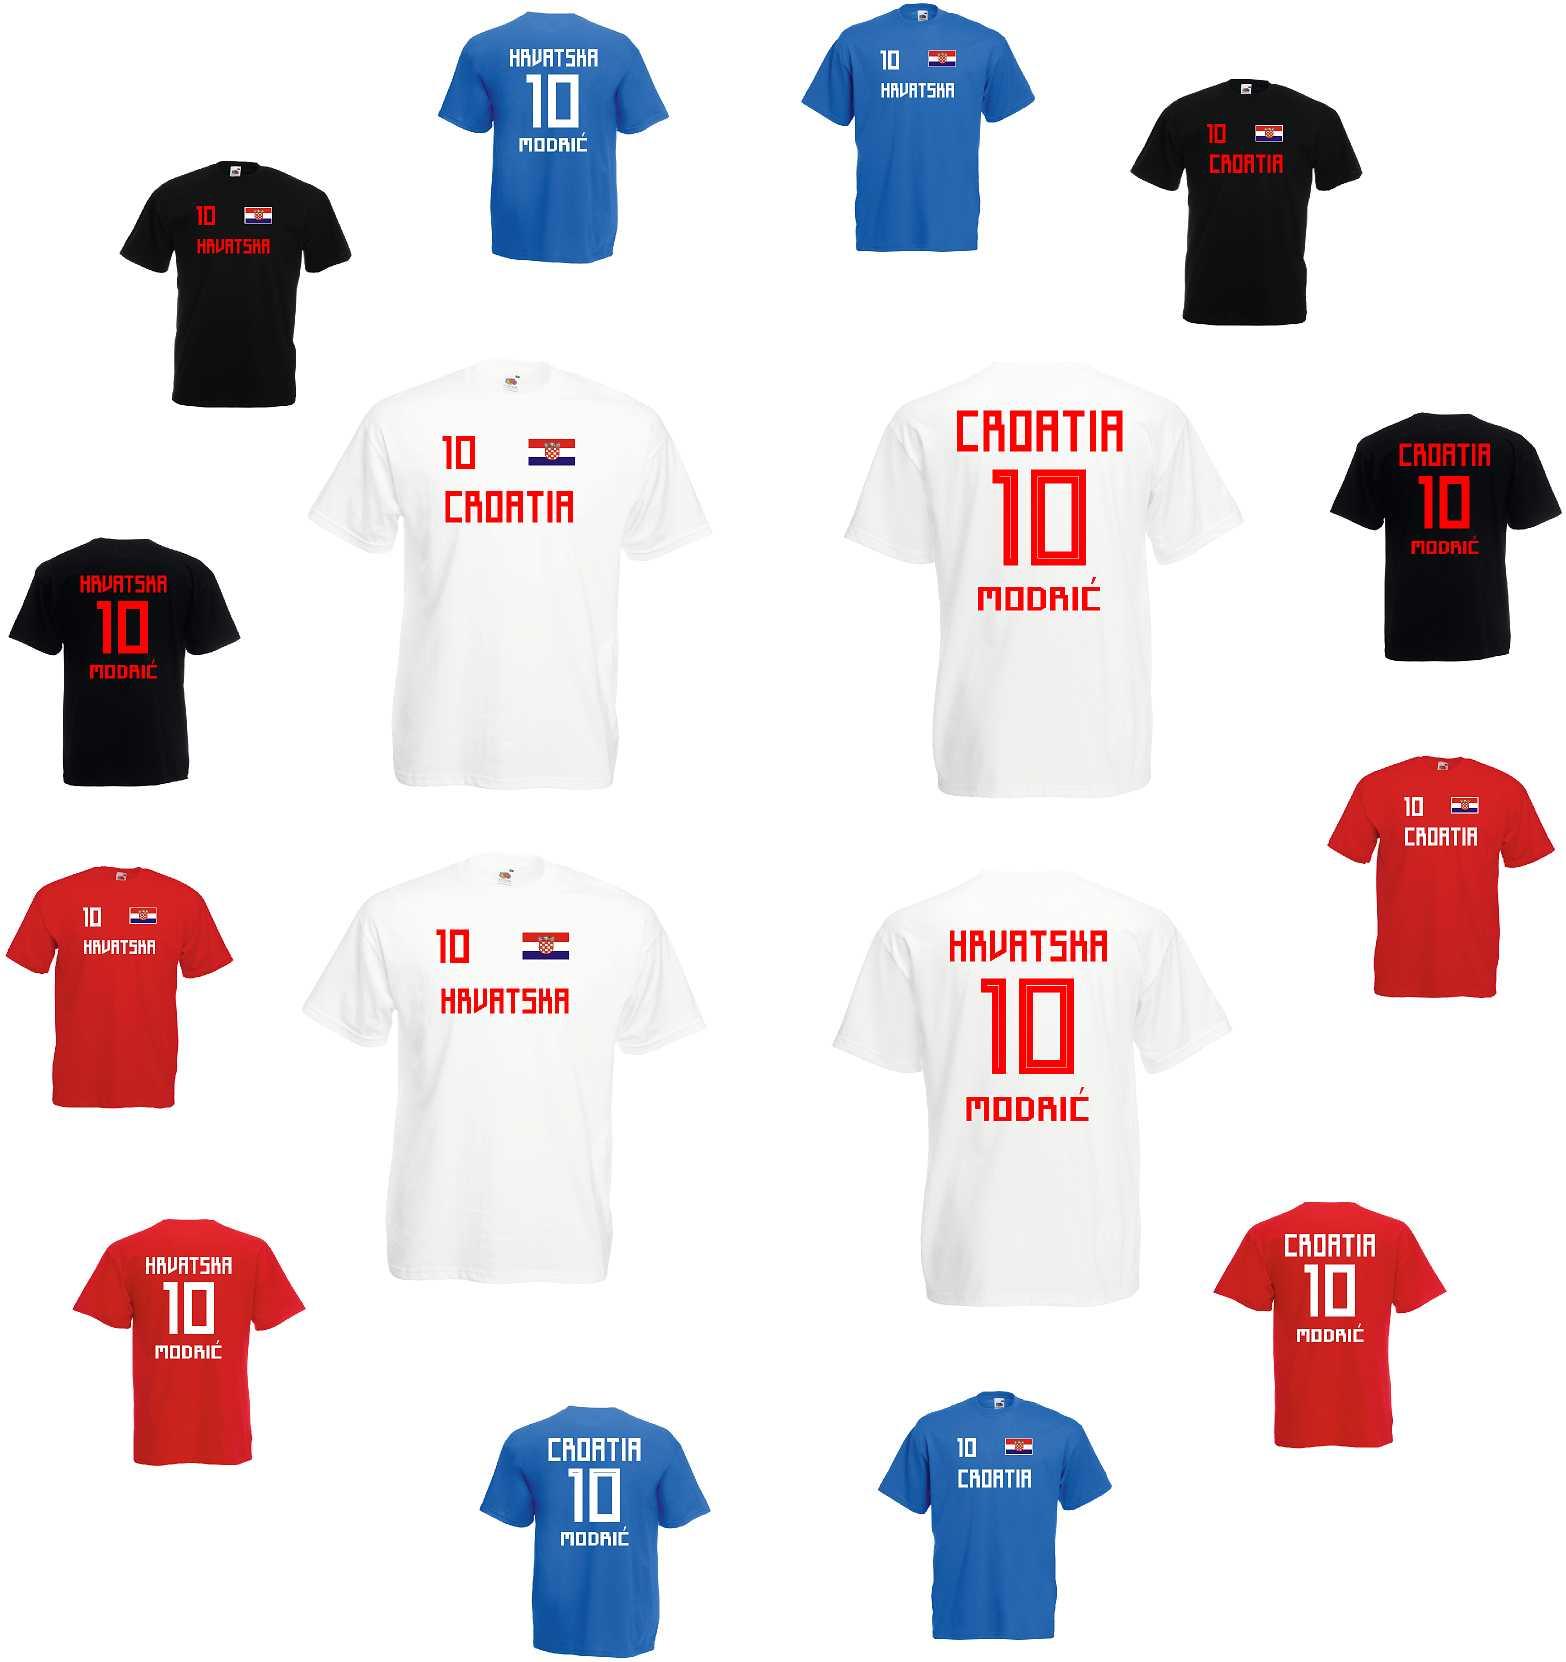 Lady T-Shirt Fussballshirt Croatia Kroatien mit Ihrem Wunschnamen bedruckt,